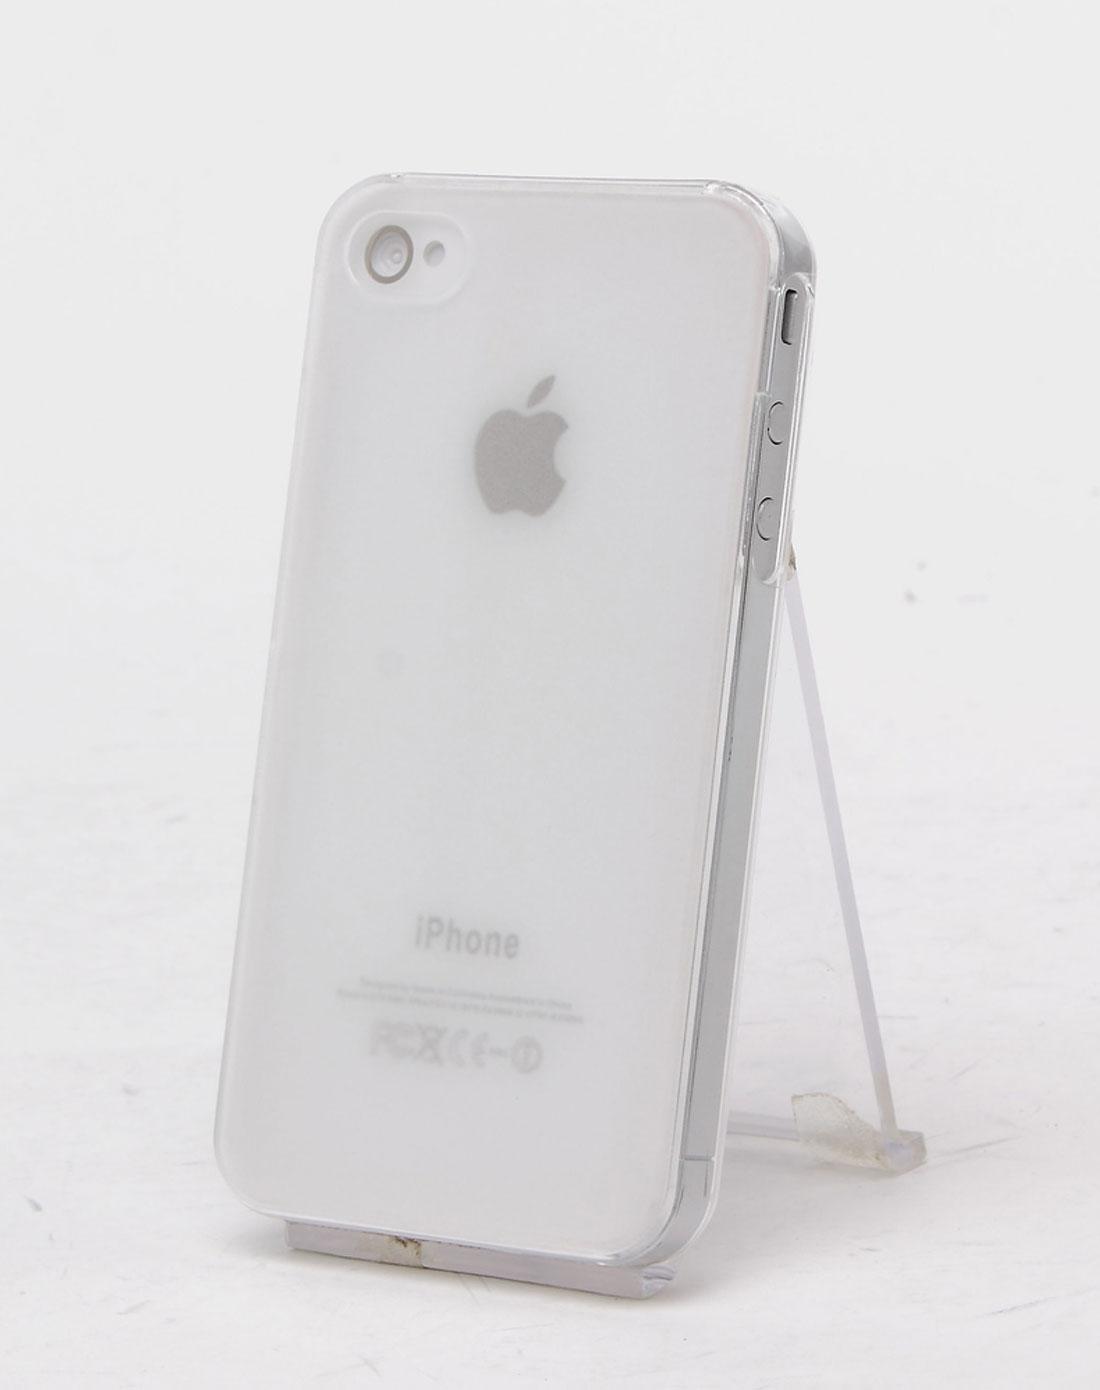 iphone4/4s 白色磨砂透明手机壳